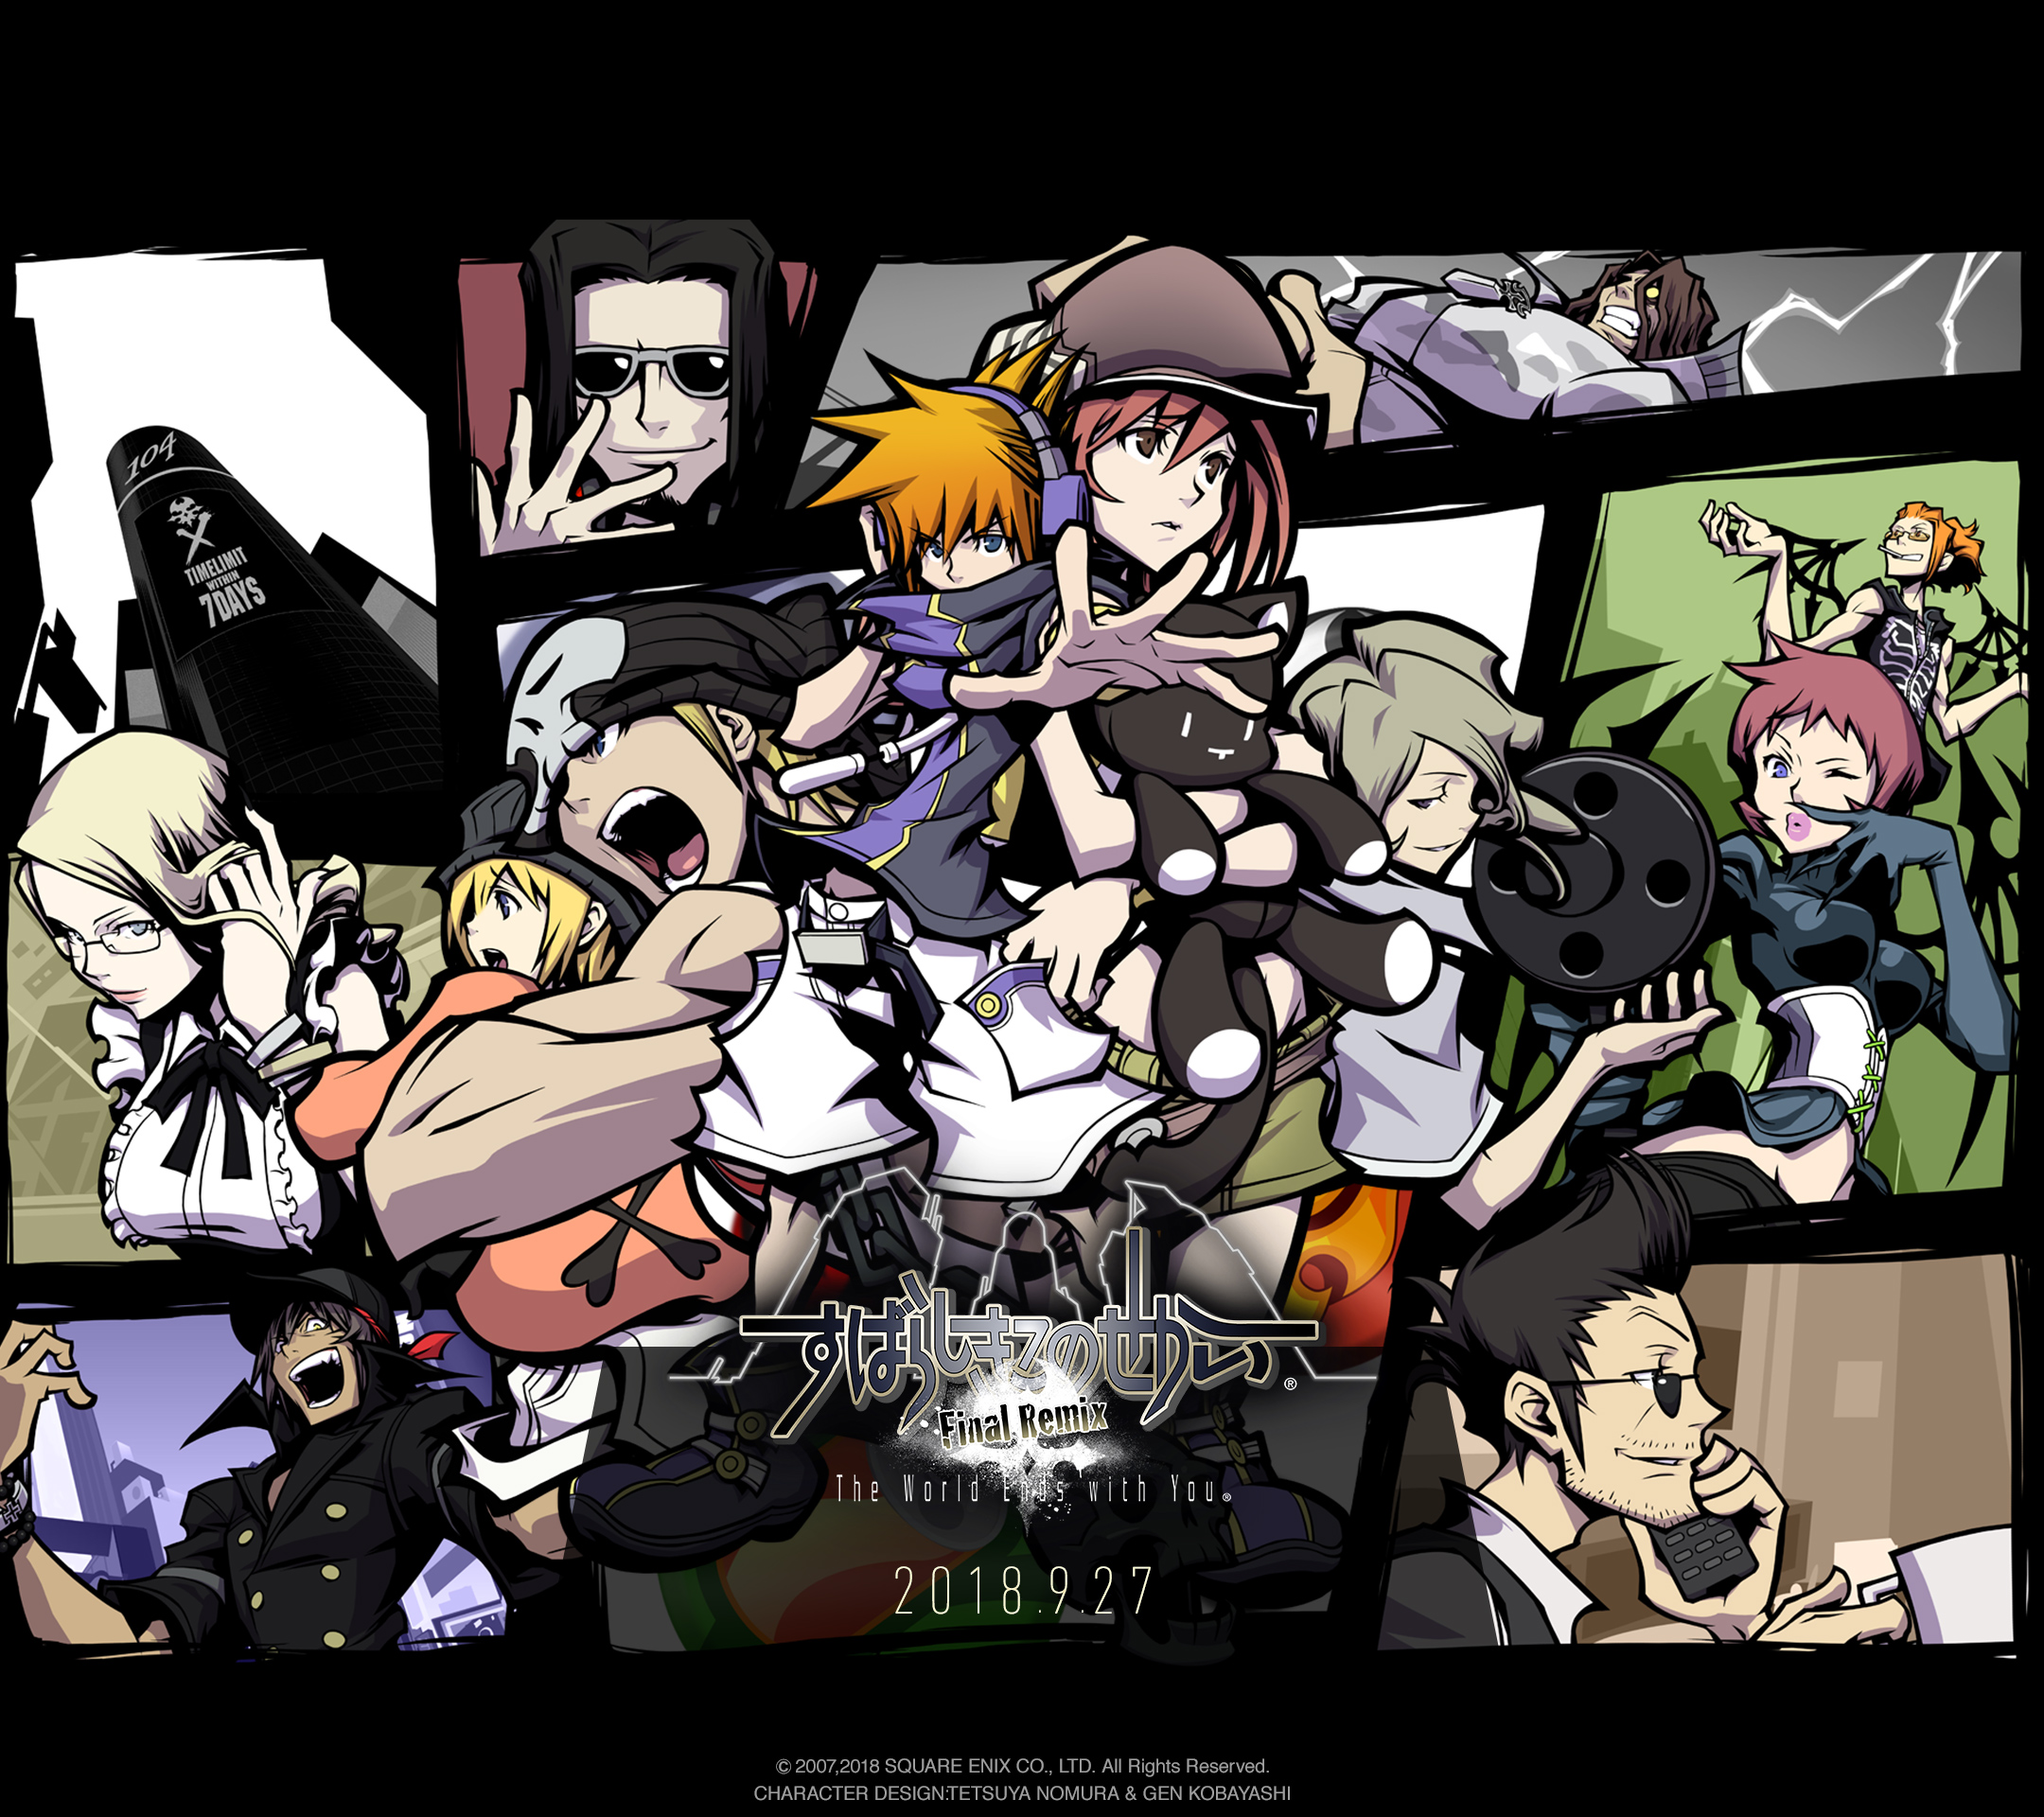 Fan Kit すばらしきこのせかい Final Remix Square Enix